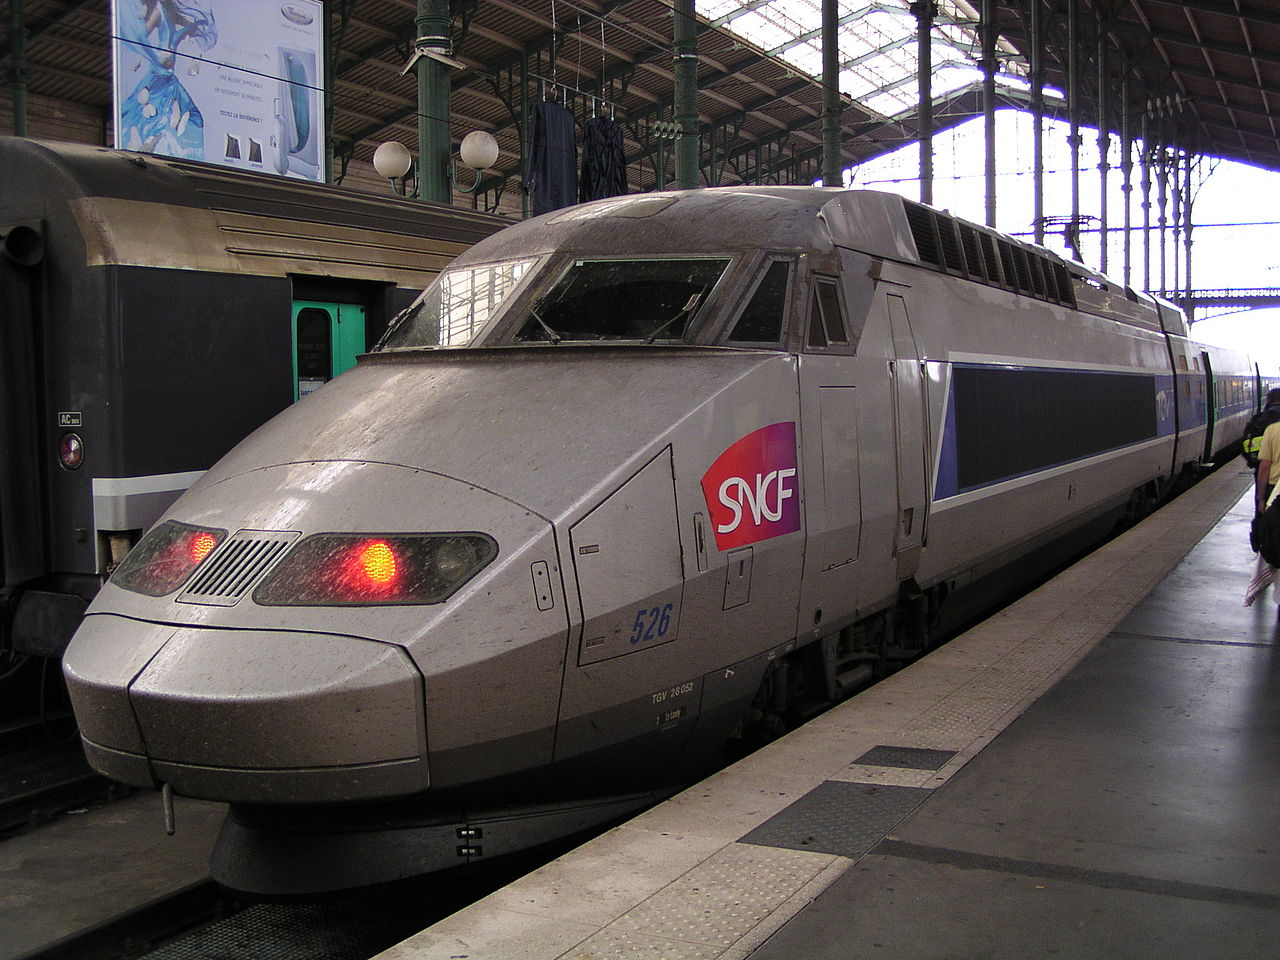 法國國鐵 SNCF(圖/CC BY-SA 3.0)